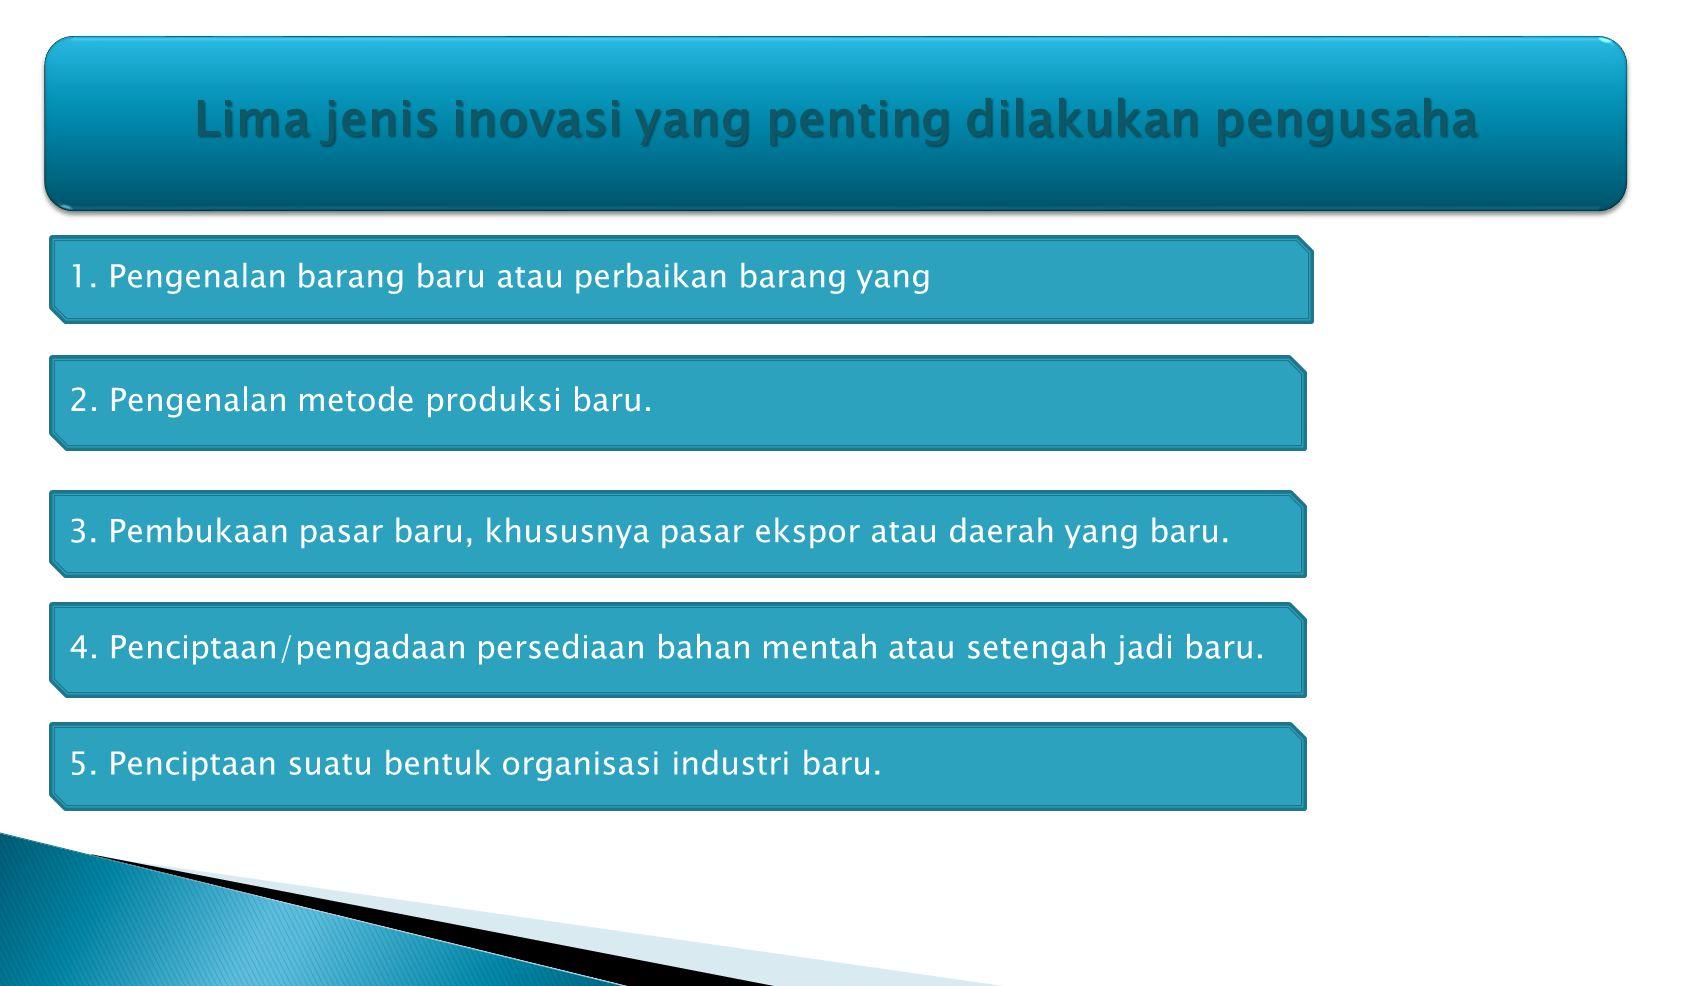 Lima jenis inovasi yang penting dilakukan pengusaha Lima jenis inovasi yang penting dilakukan pengusaha 1. Pengenalan barang baru atau perbaikan baran